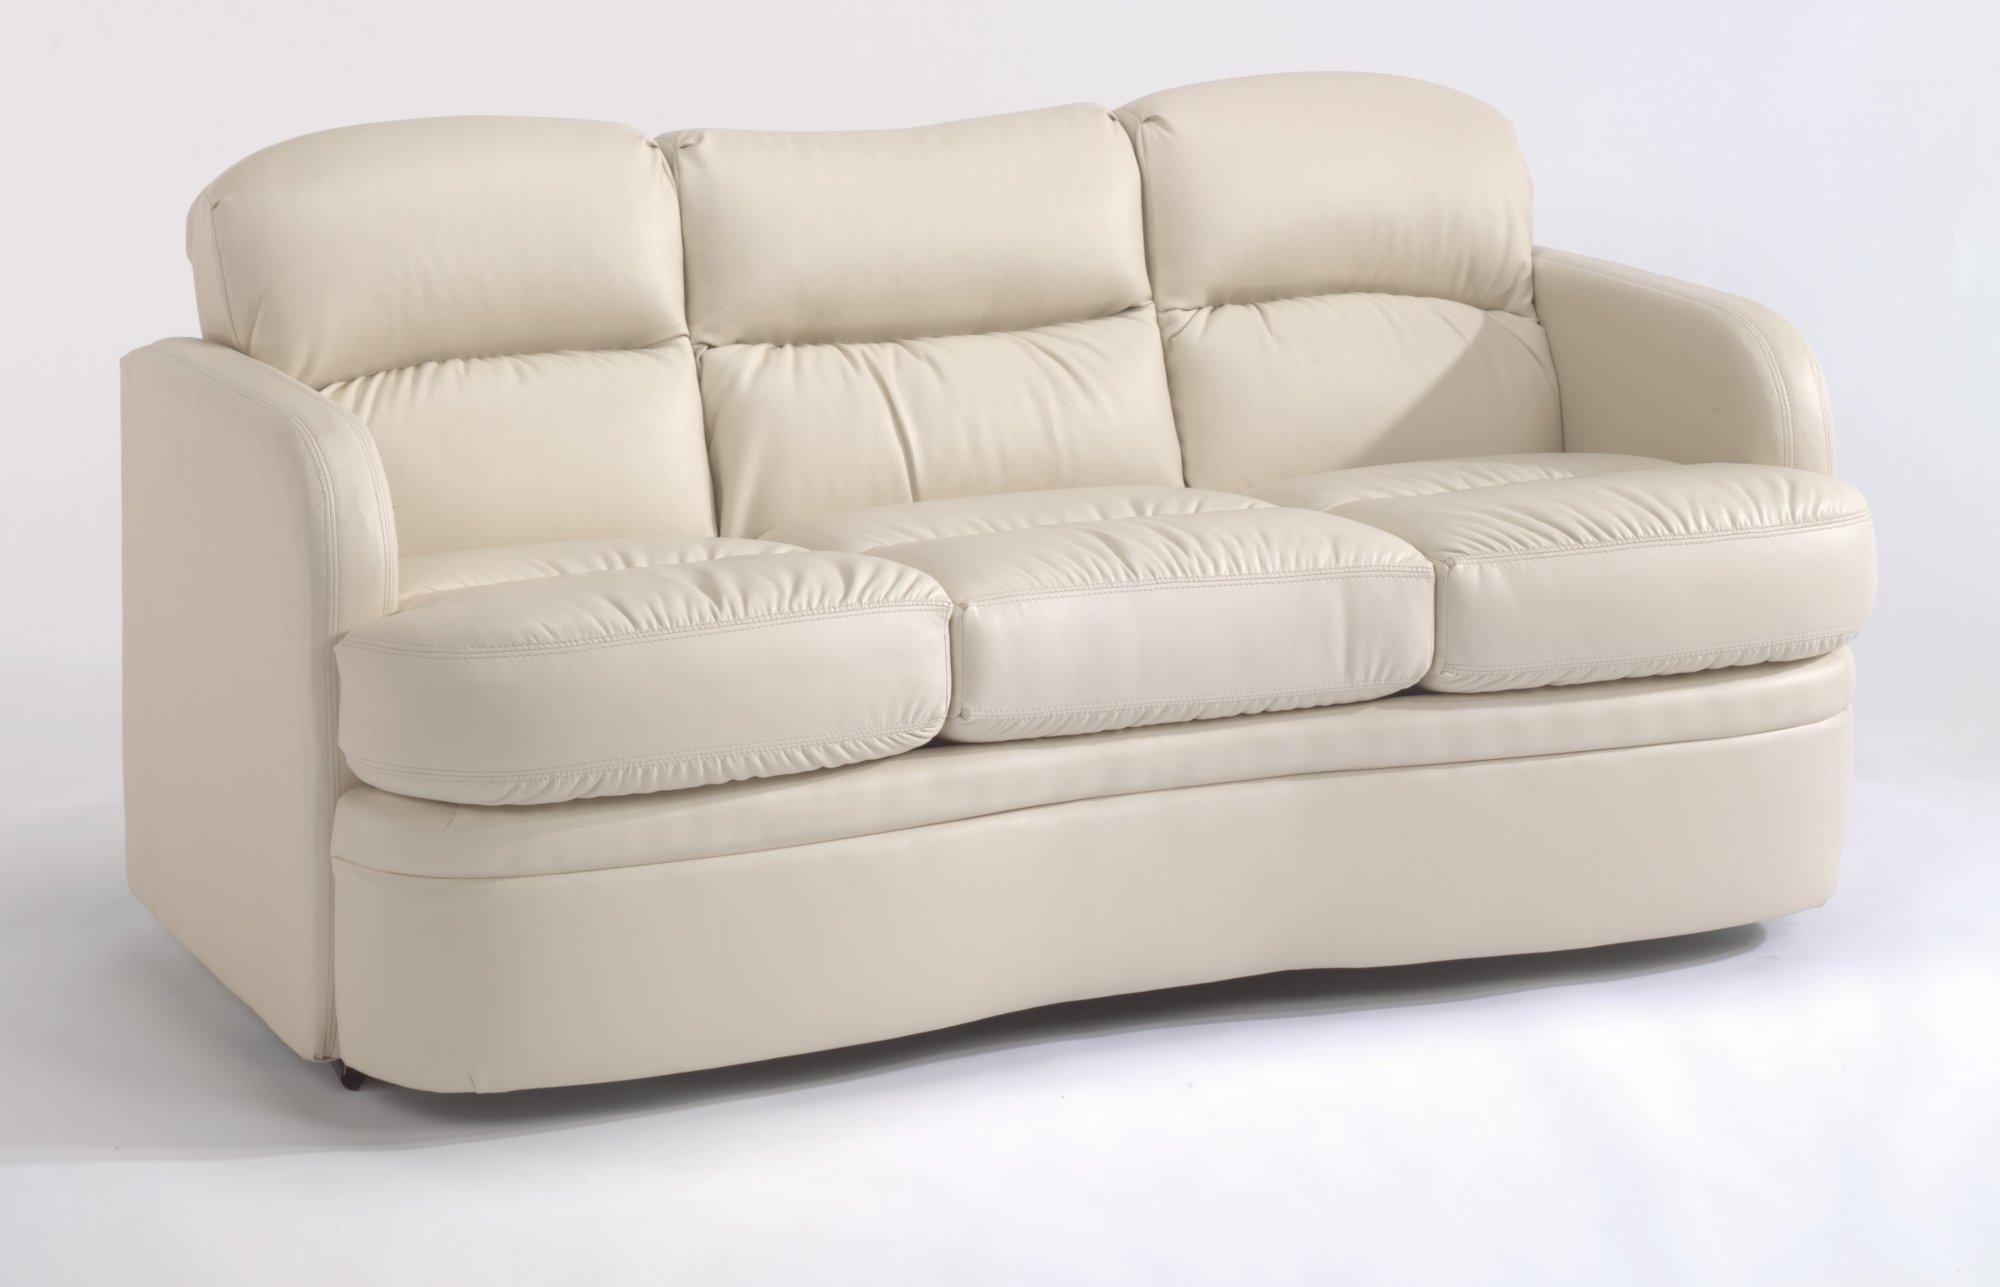 Flexsteel Onata  Motor Home Convertible Sofa Sleeper